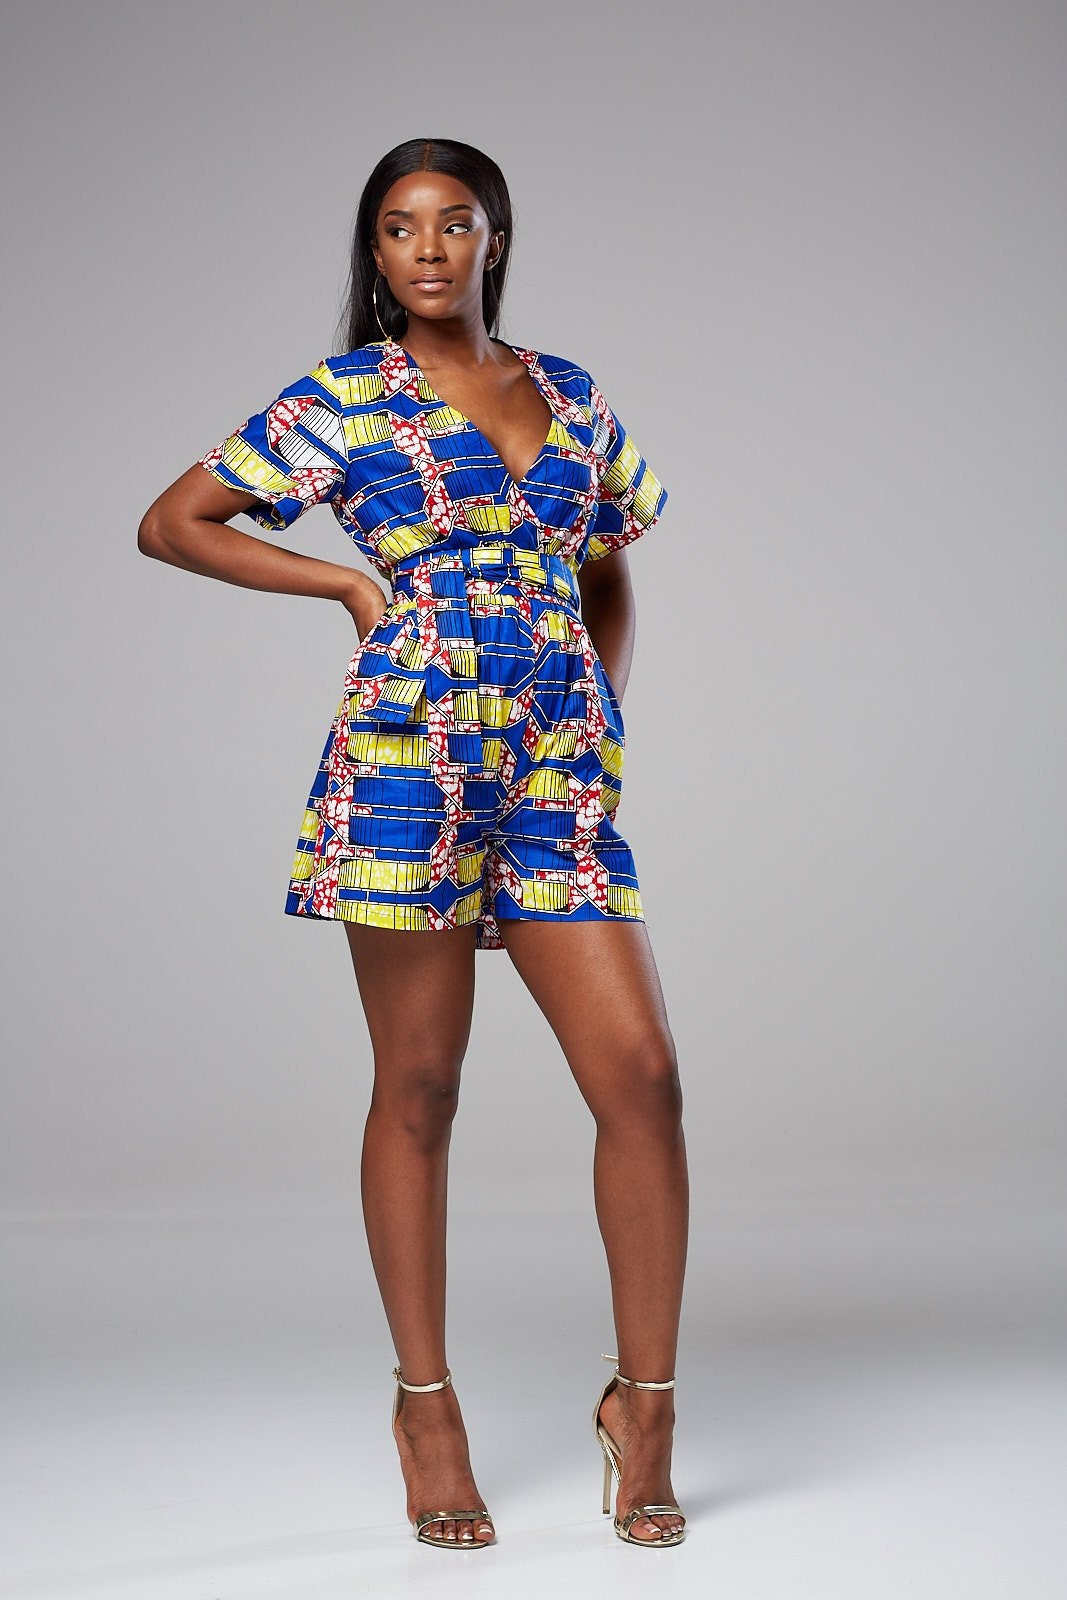 dadb76ac8200 Dashiki romper African clothing for women African romper